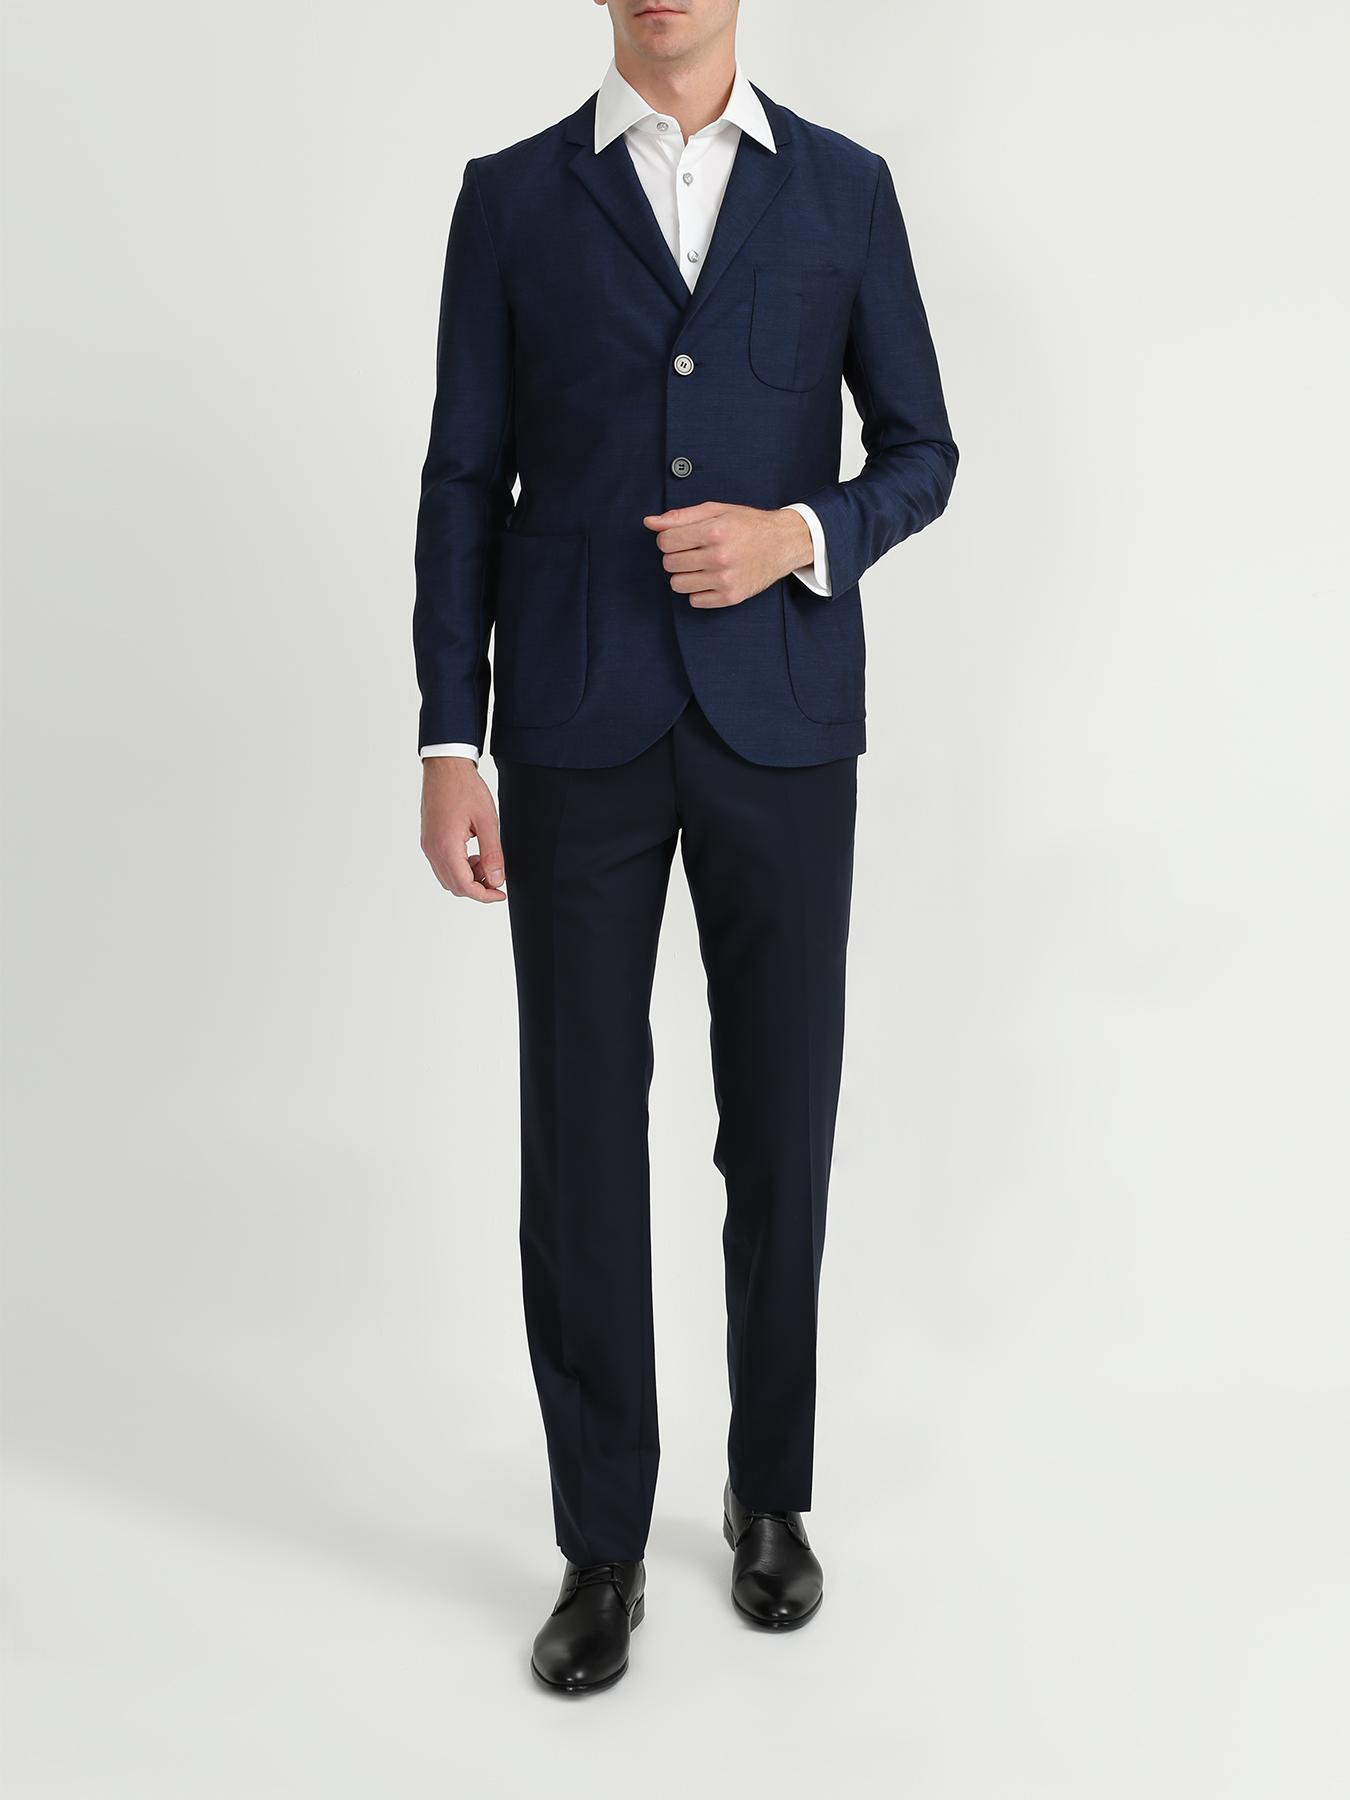 Пиджак Emporio Armani Пиджак пиджак emporio armani пиджак